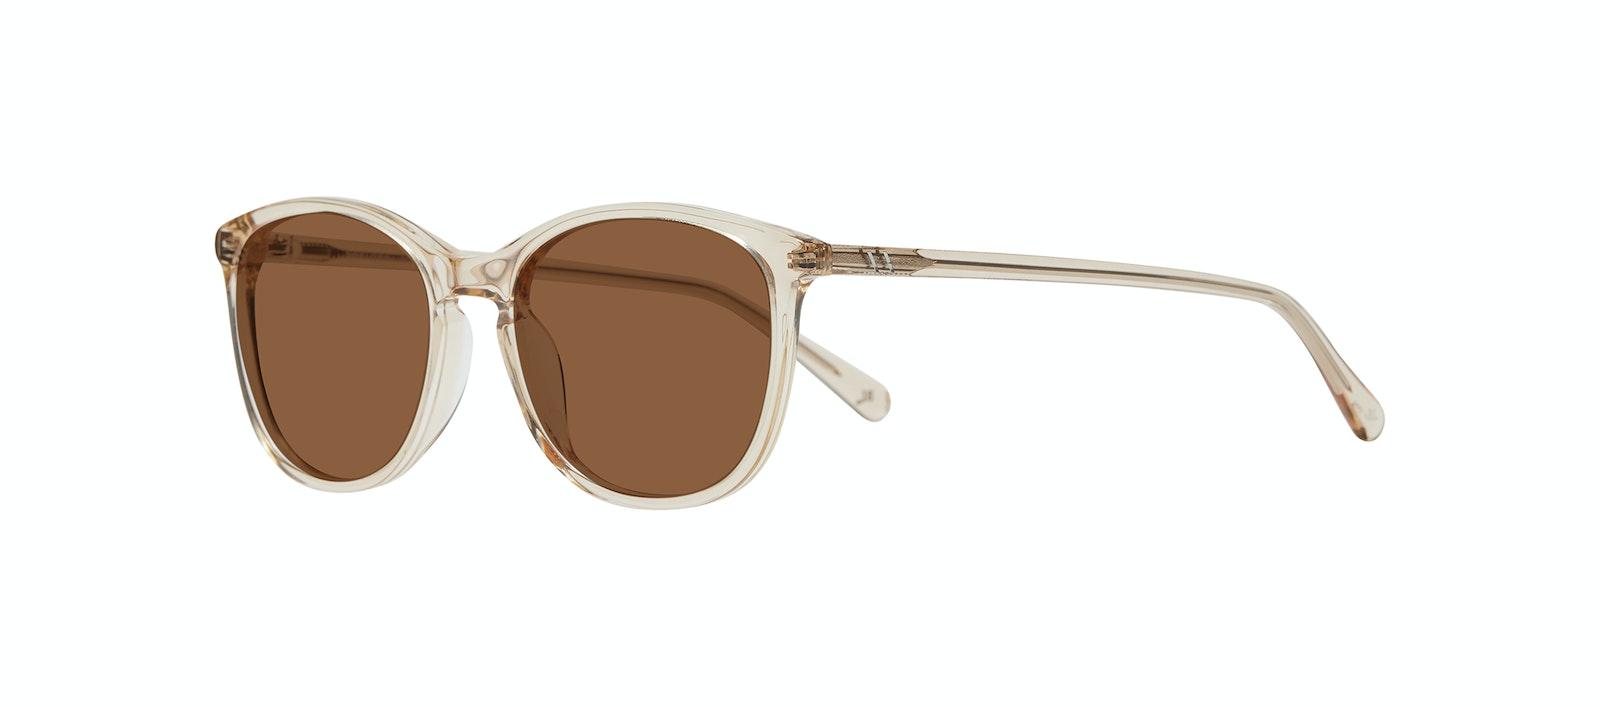 Affordable Fashion Glasses Rectangle Square Round Sunglasses Women Nadine S Prosecco Tilt